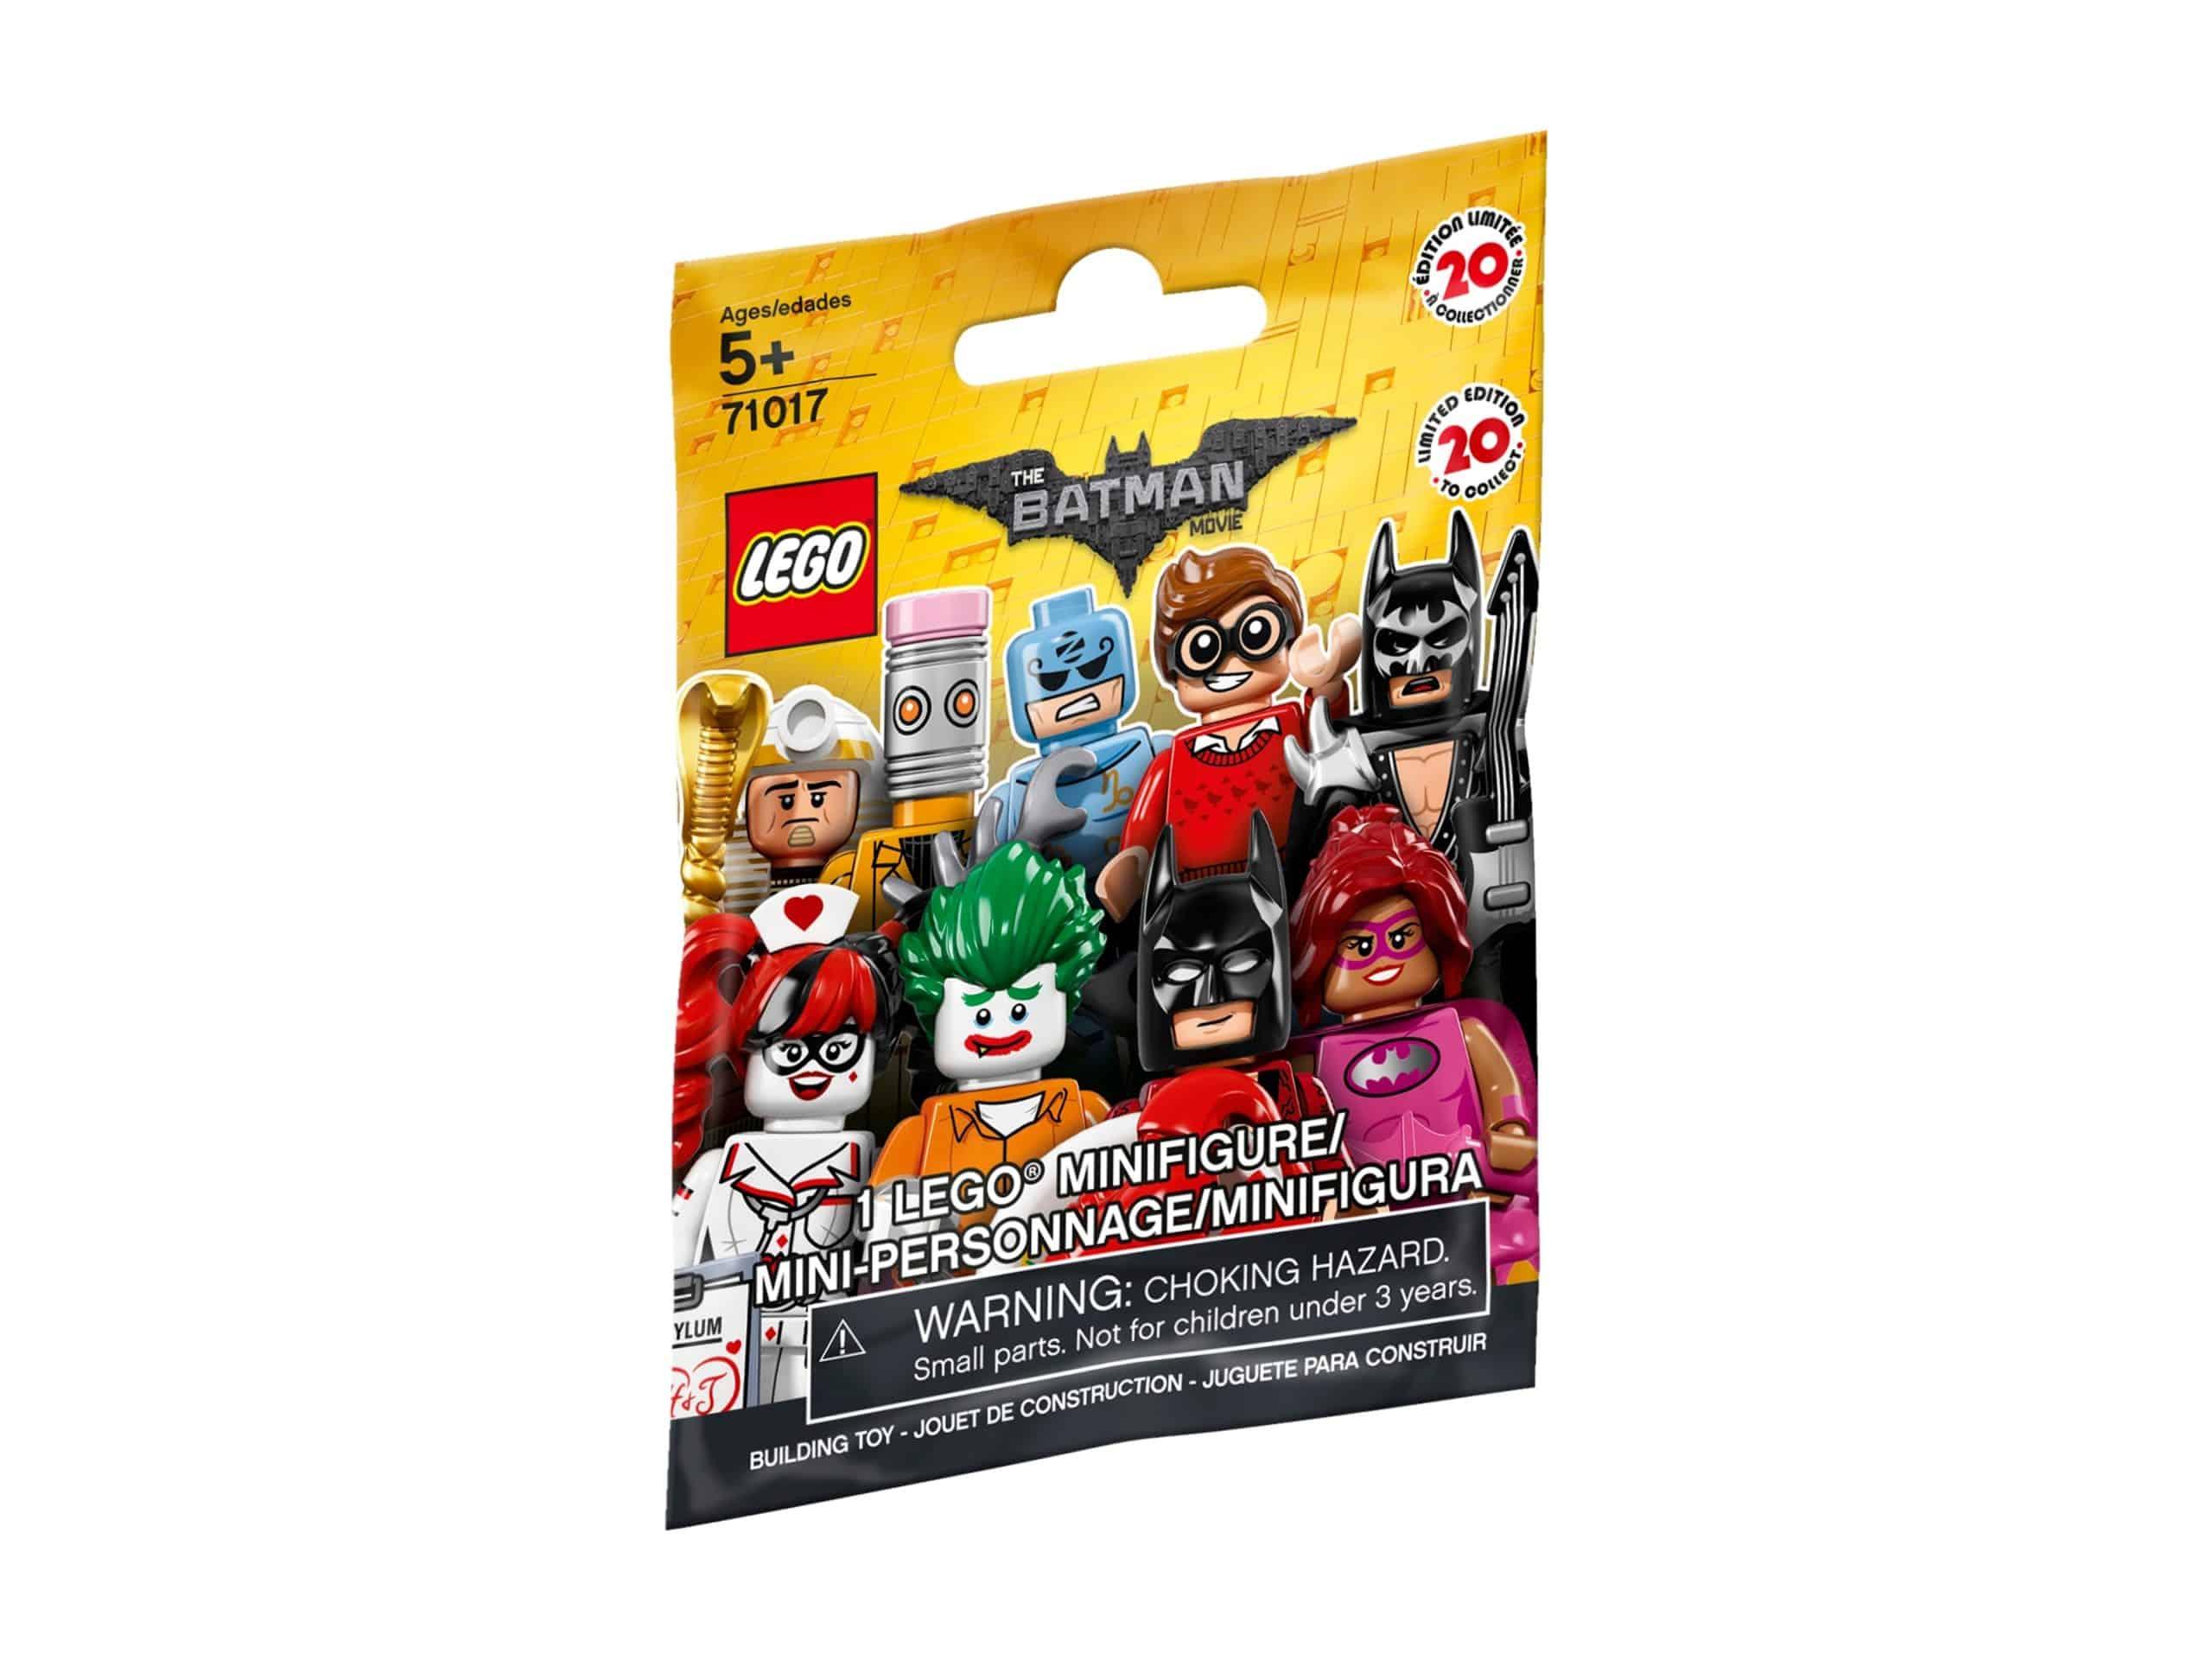 lego 71017 minifigures serie lego 71017 batman movie scaled